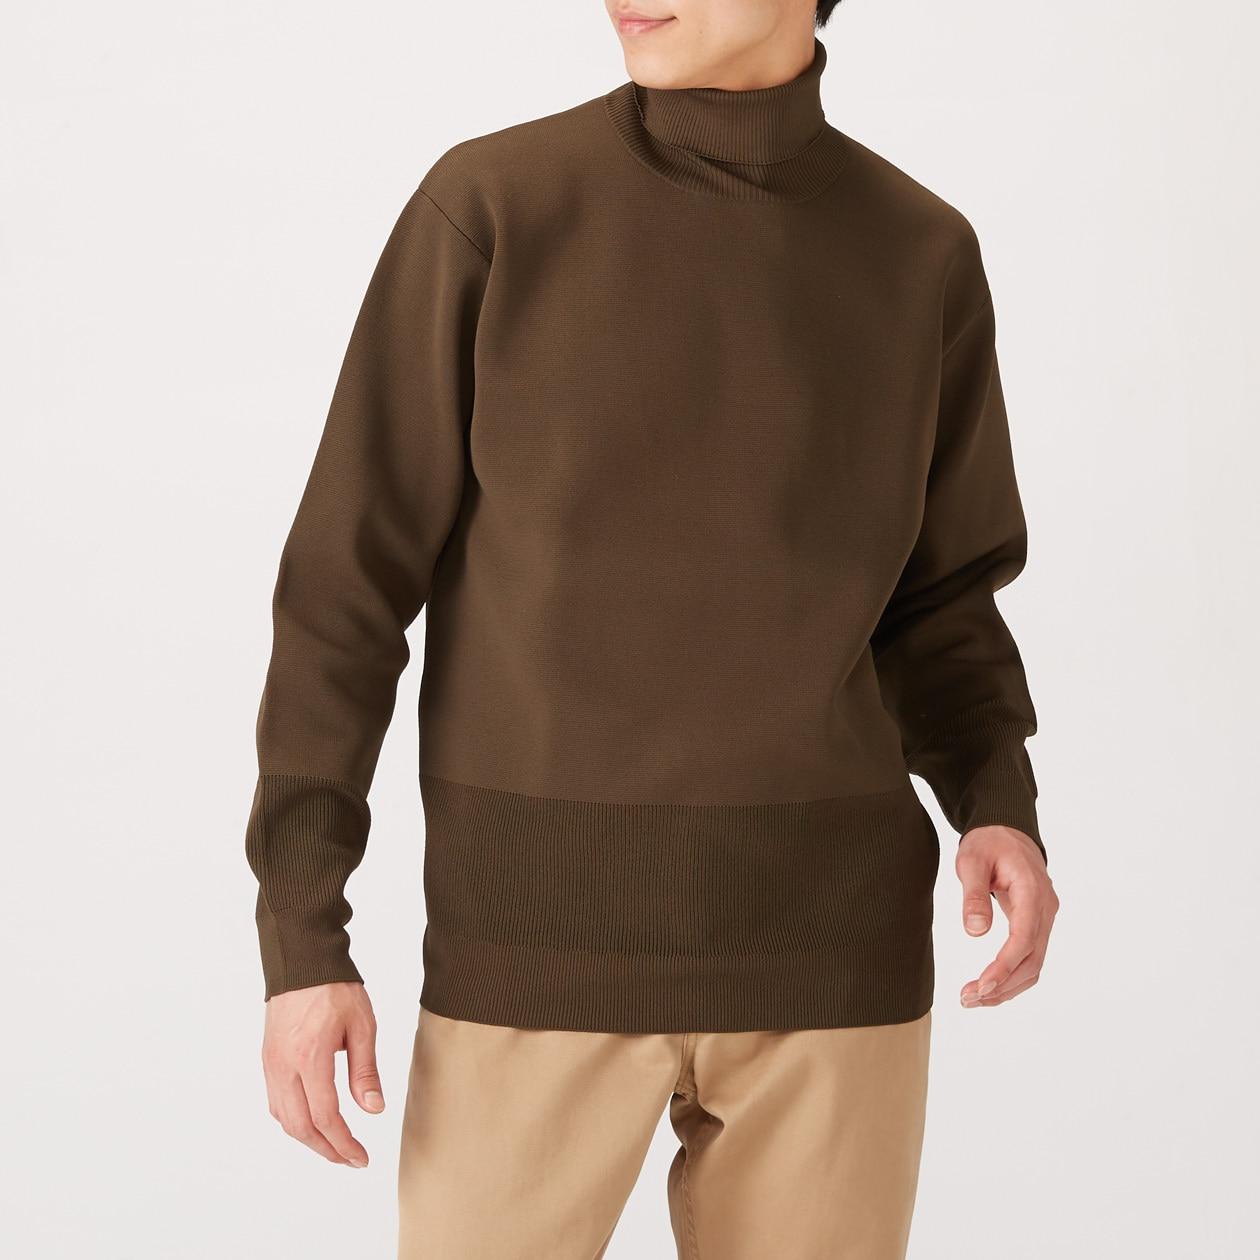 Mens Rugged Knit Turtleneck Sweater 無印良品 Muji